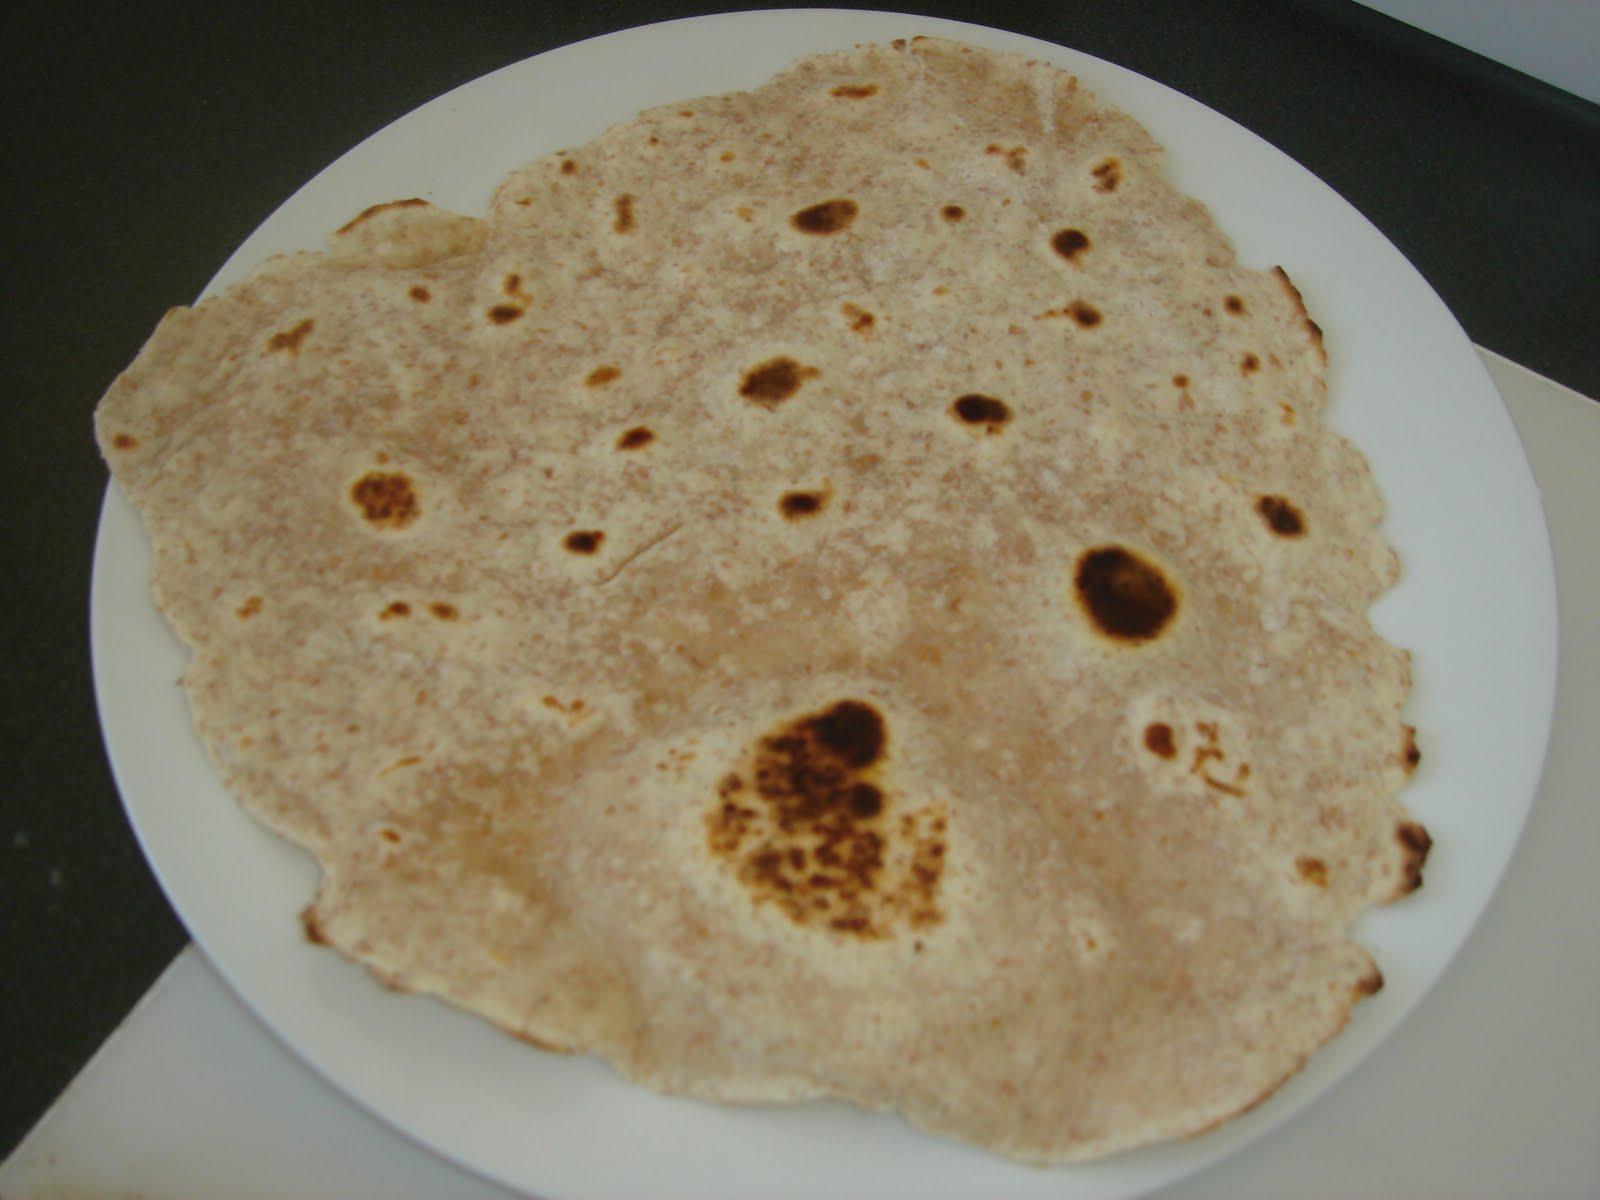 Craving Fresh: How to make tortillas